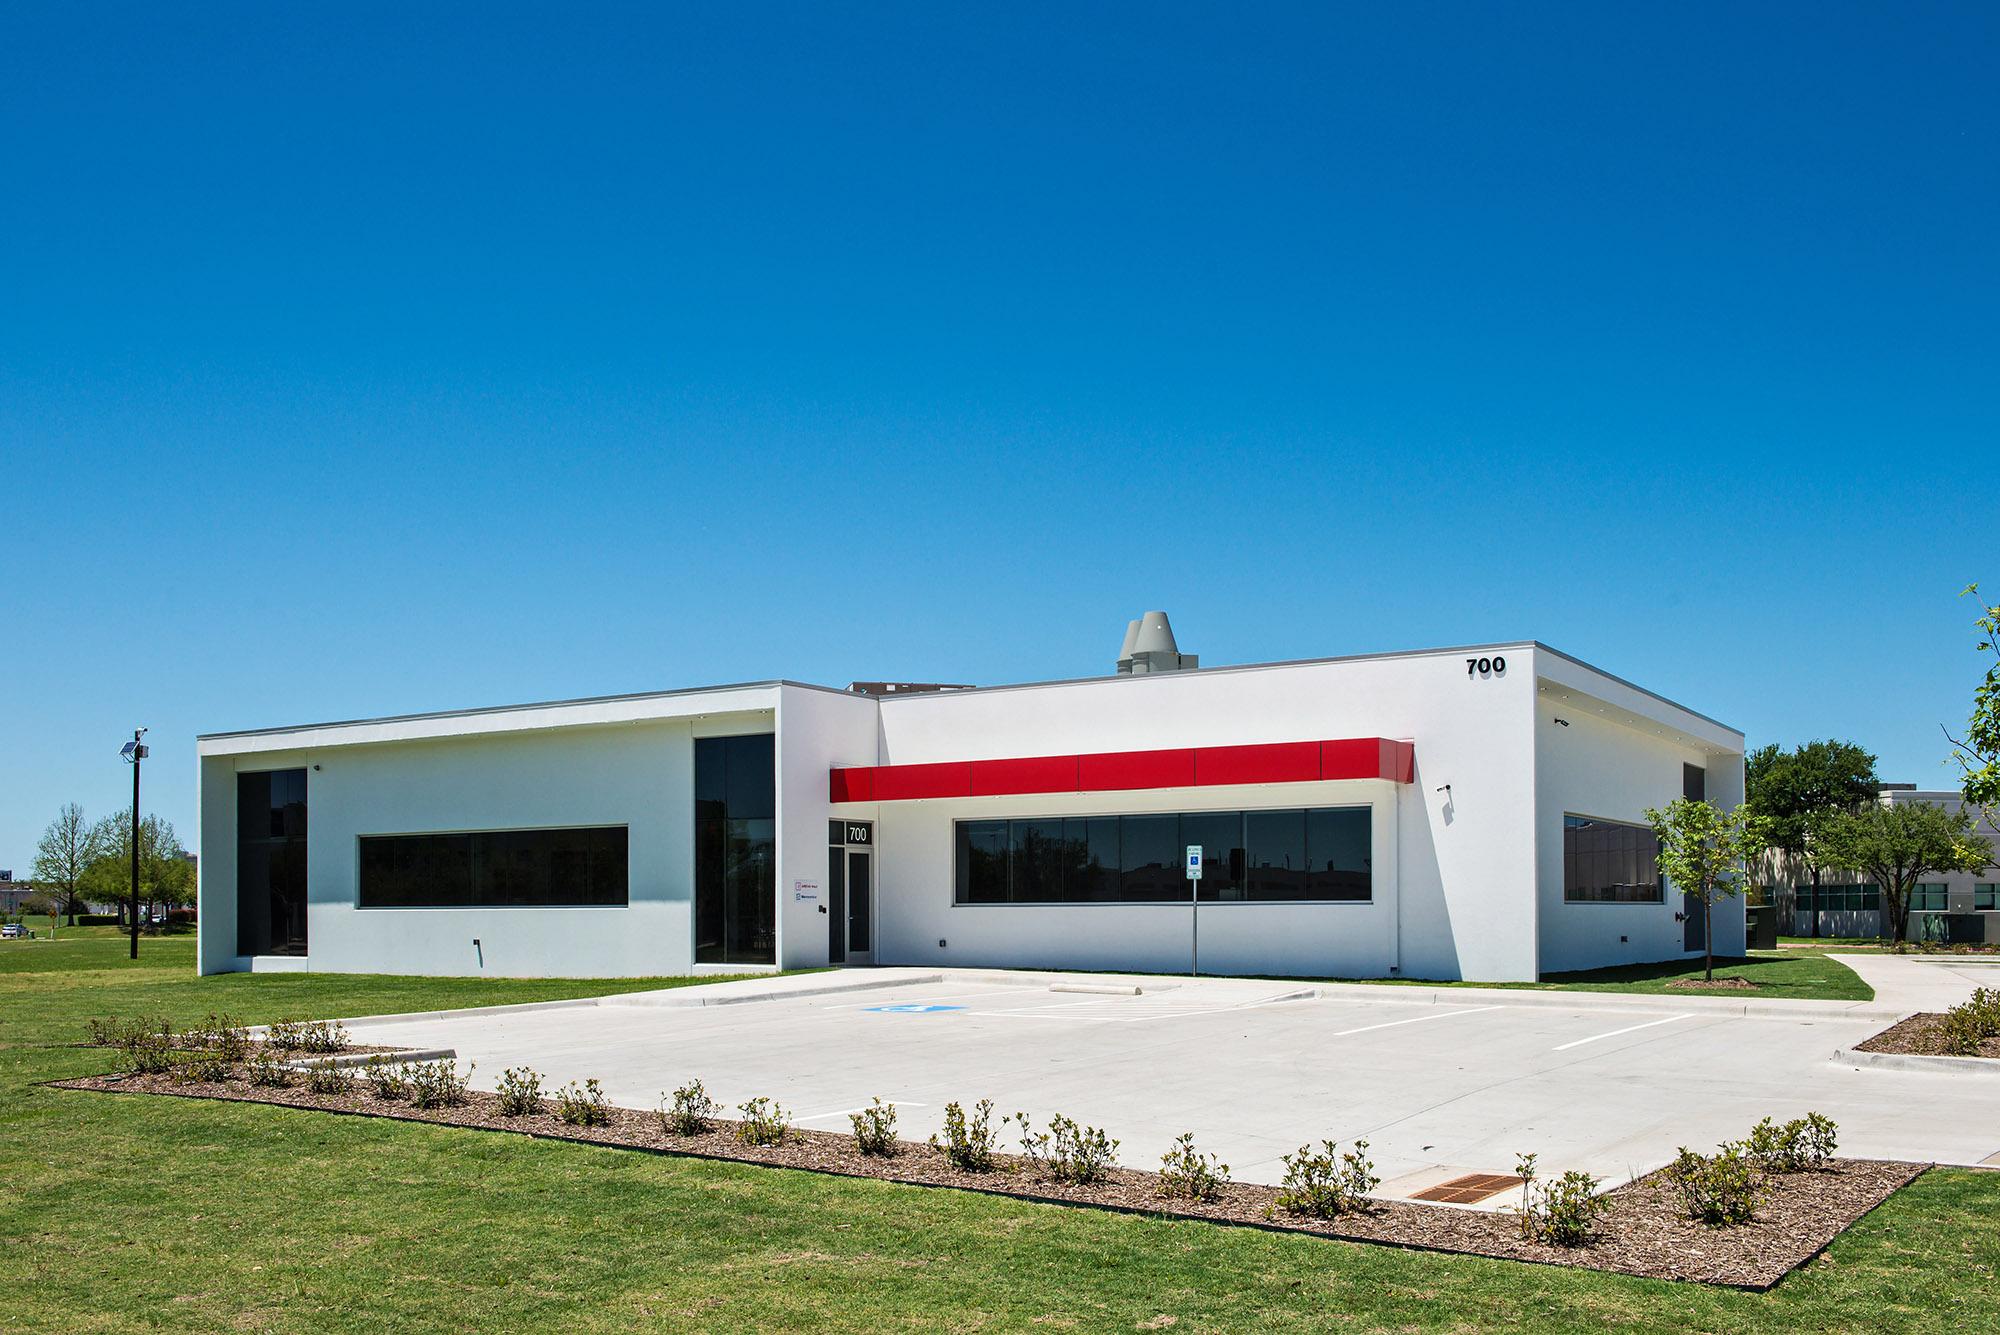 New Macrocyclcs production facility in Plano, TX